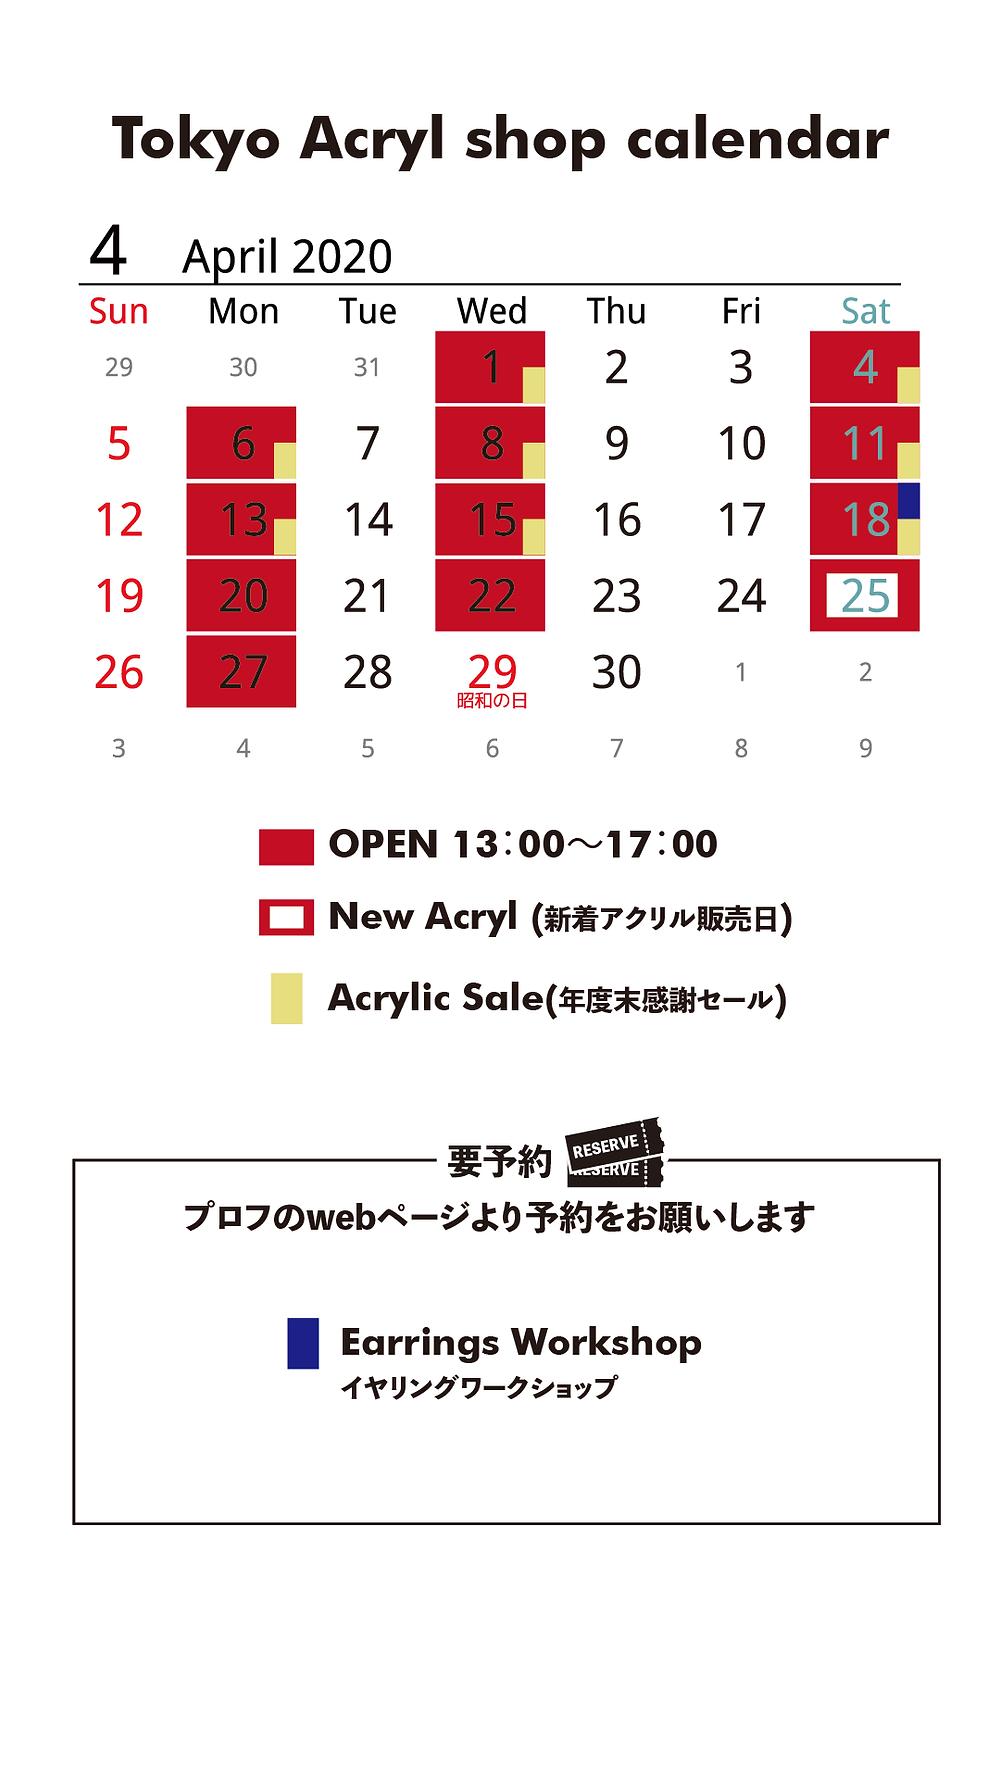 Tokyo Acryl shop calender 2020.4